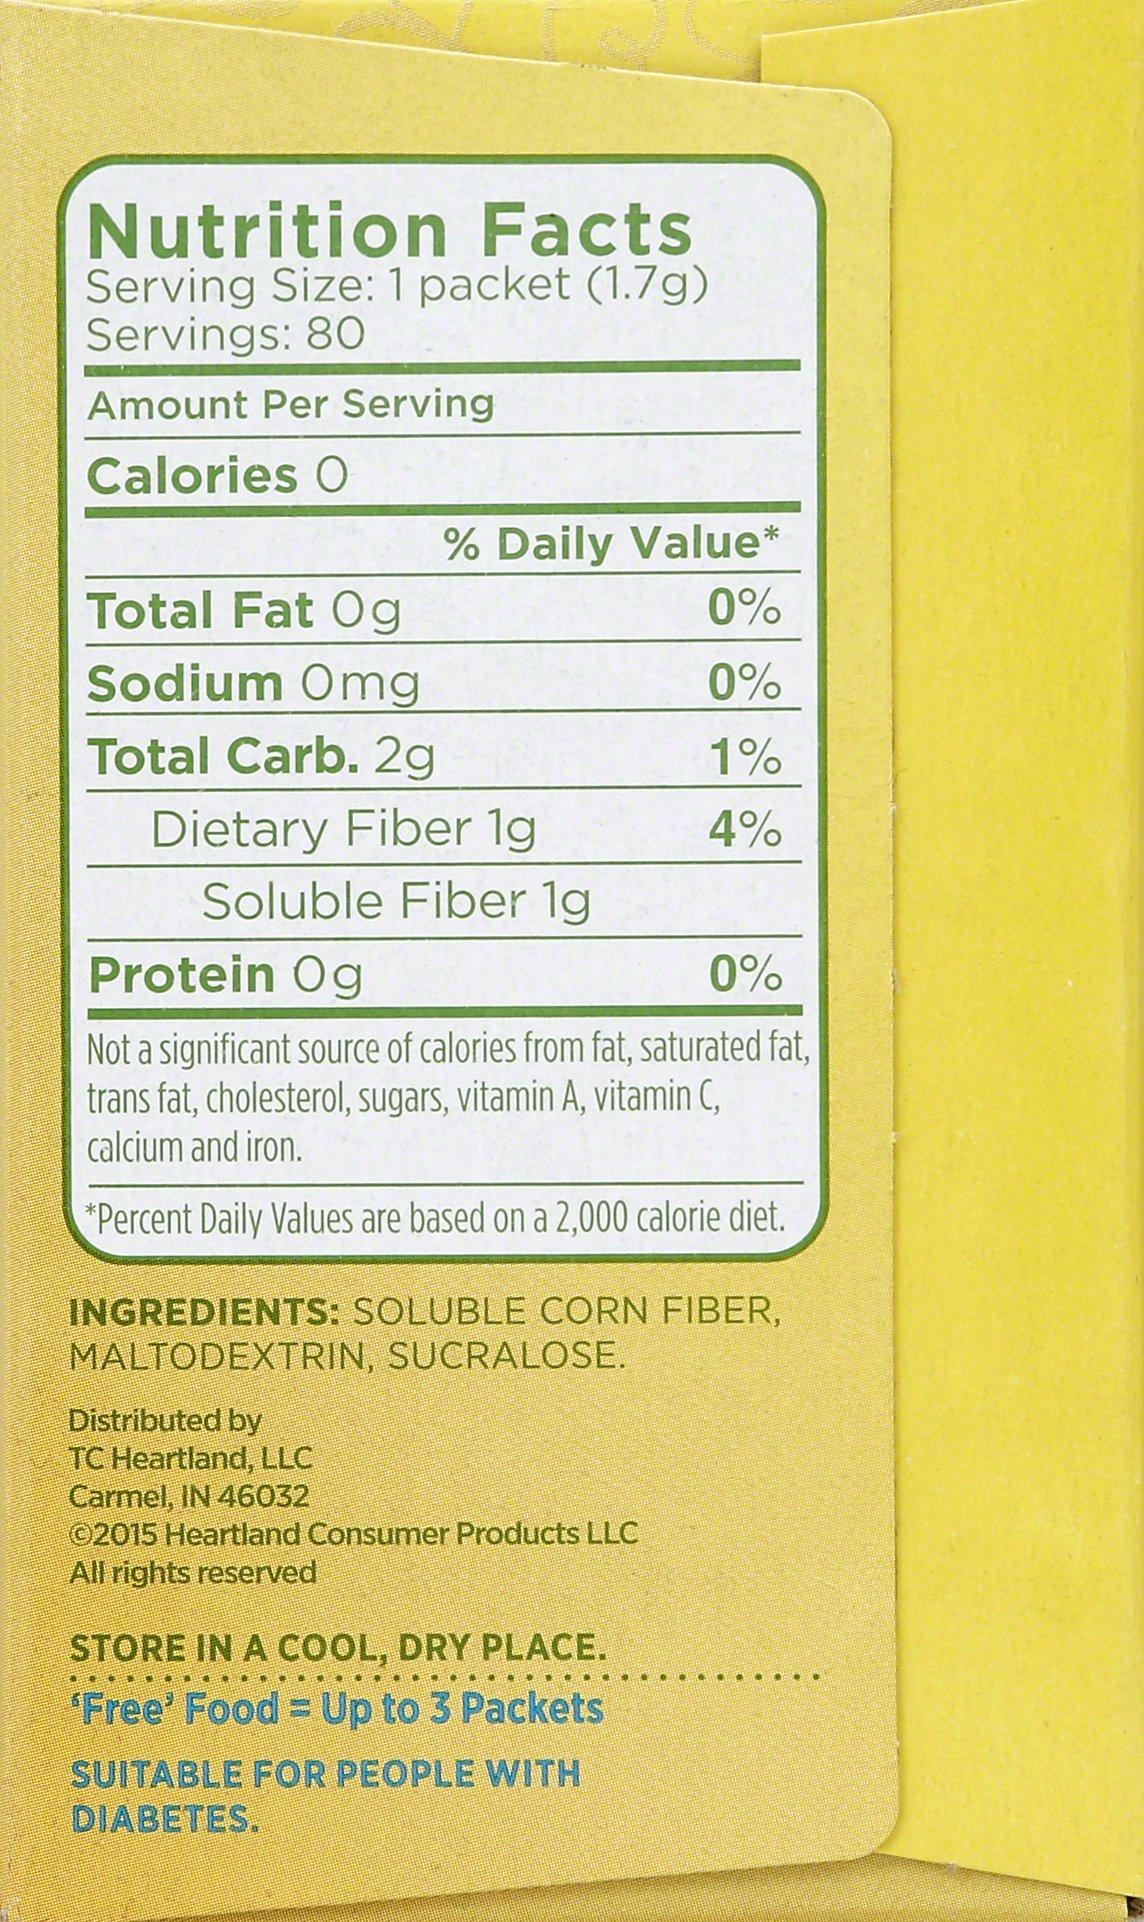 JOJ201800   Splenda No Calorie Sweetener with Fiber, Yellow, 80 Count (1G Fiber) by Splenda (Image #4)